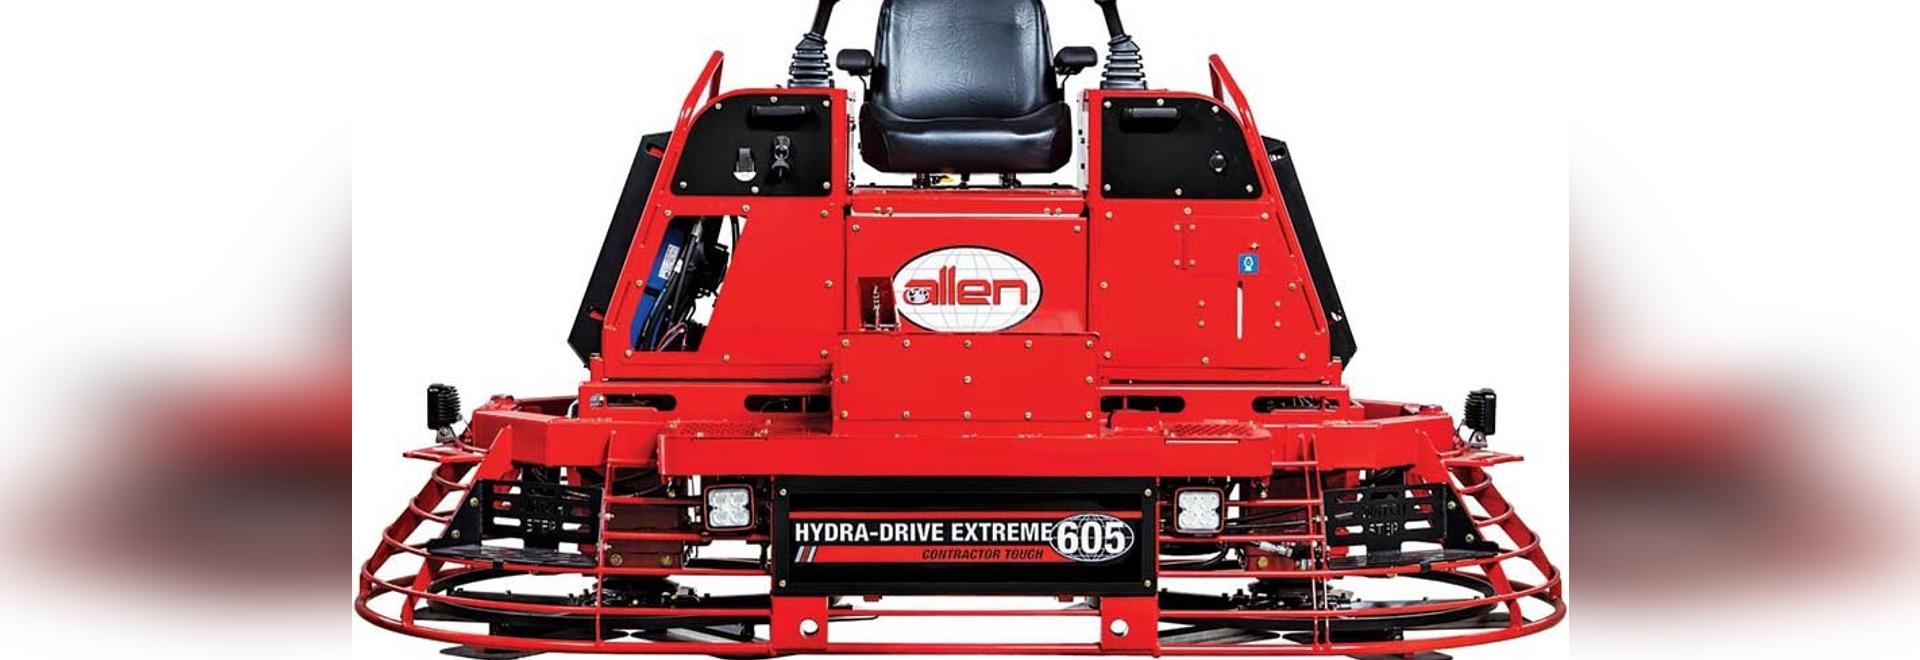 Allen Engineering HDX605 Paseo-en la paleta